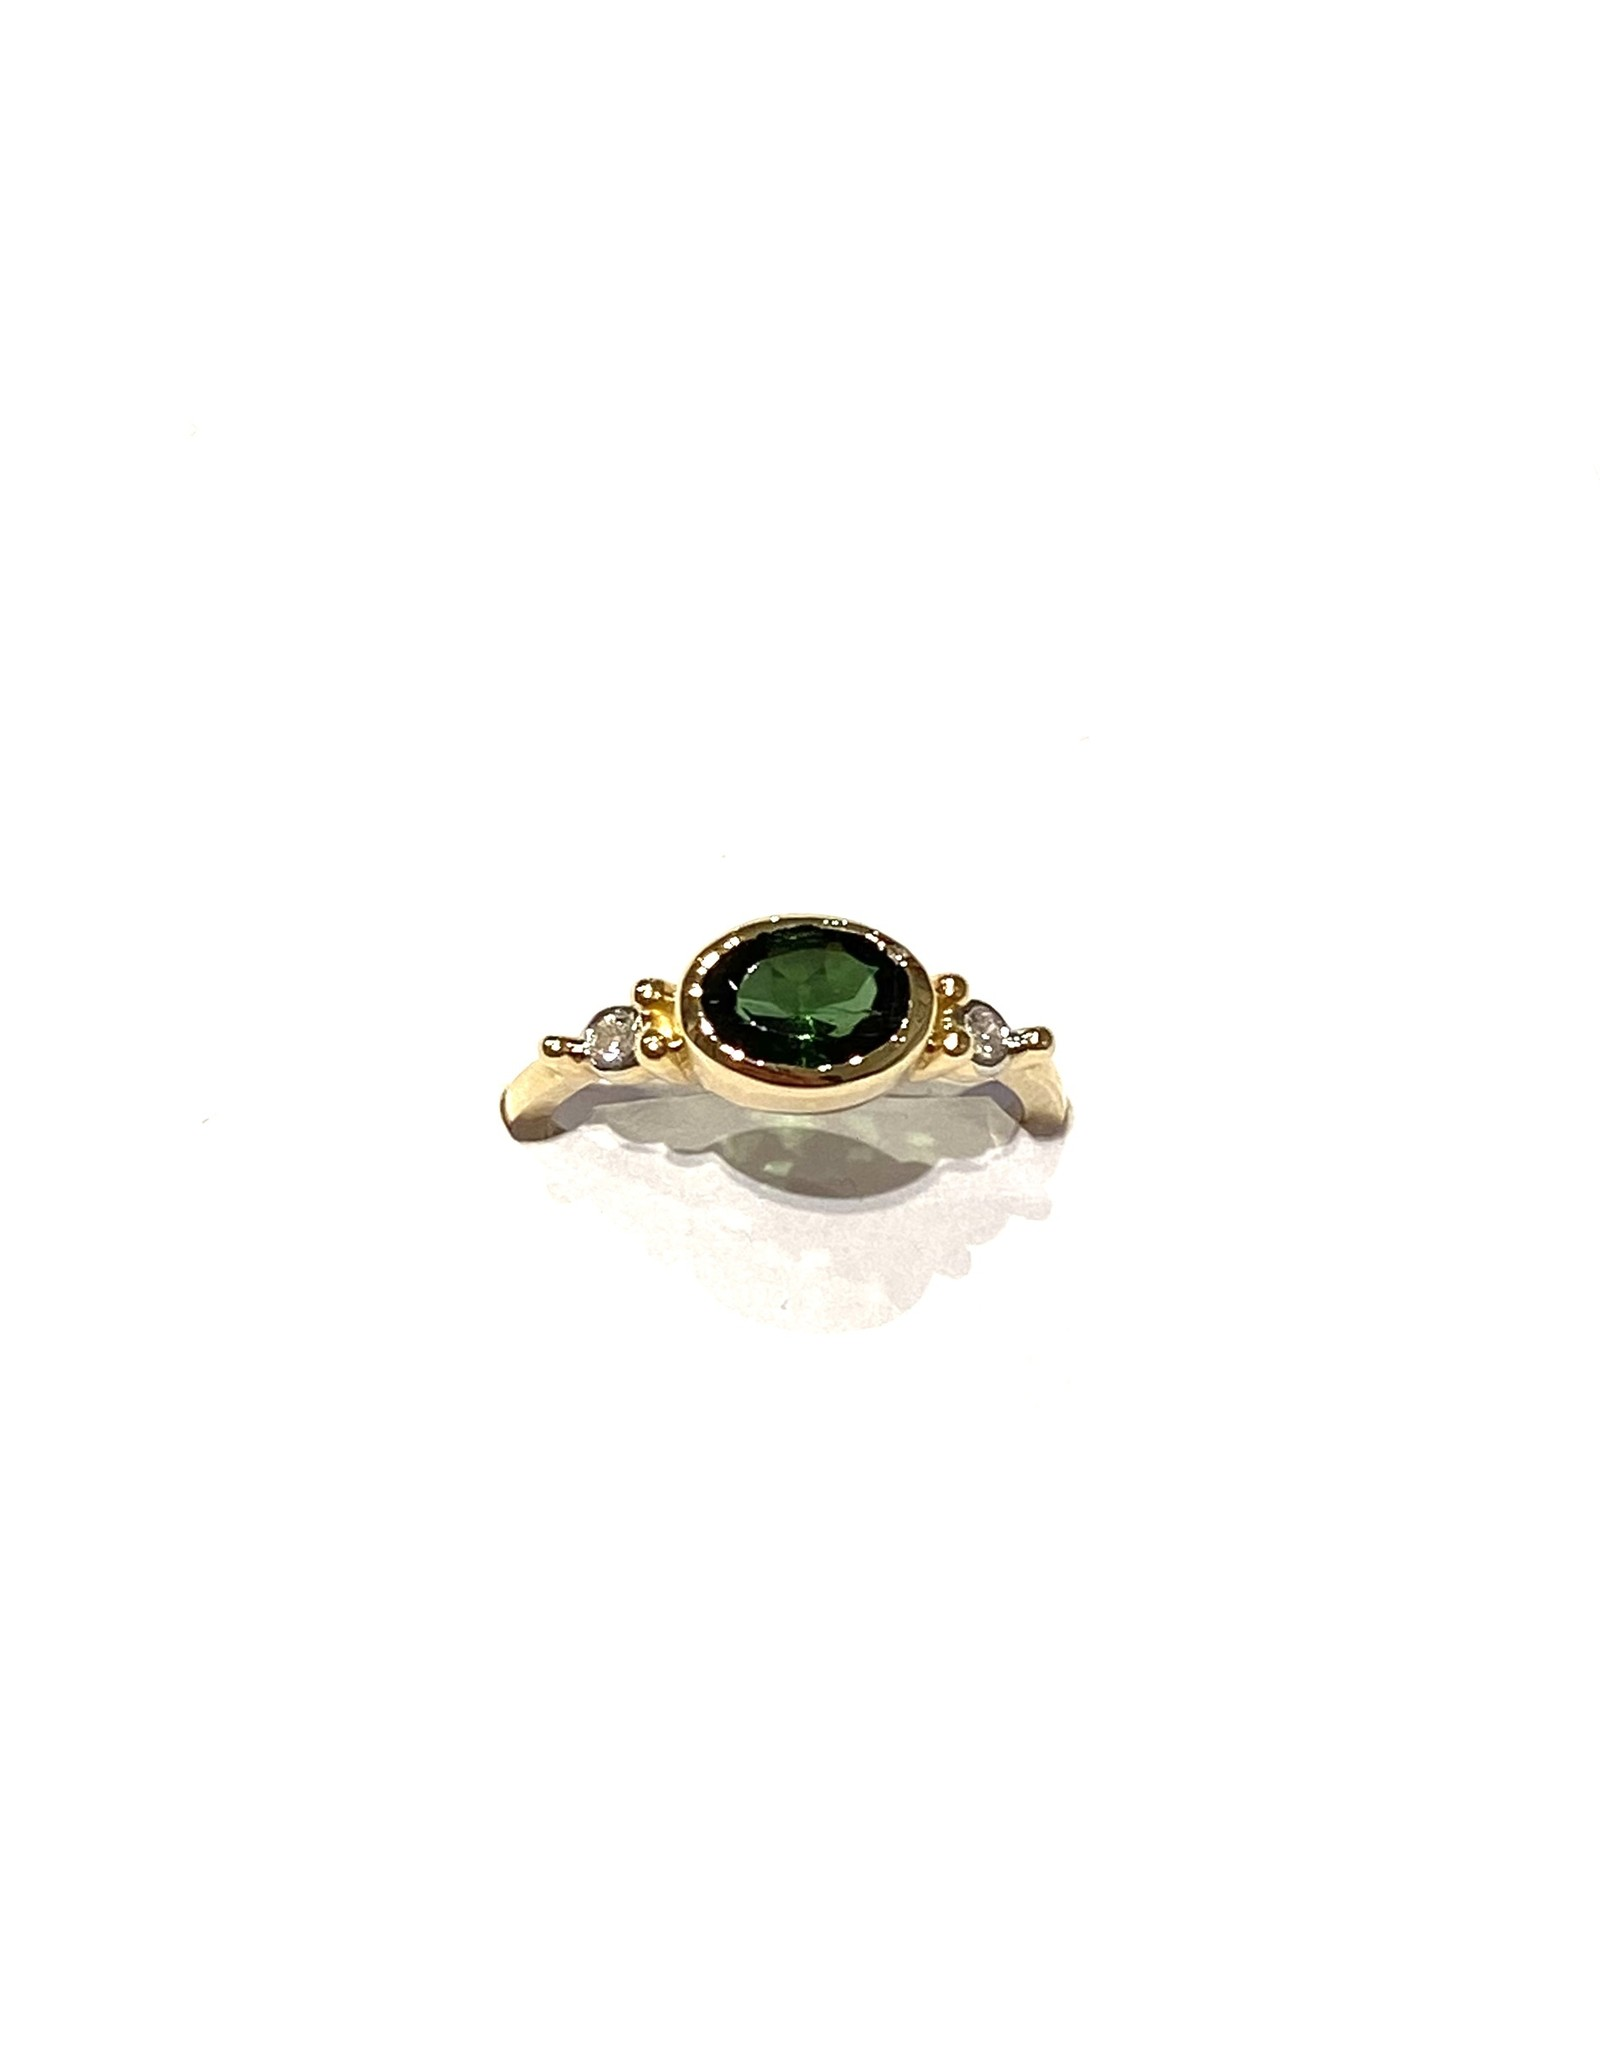 Bo Gold Ring - Gold - Tourmaline - Diamond